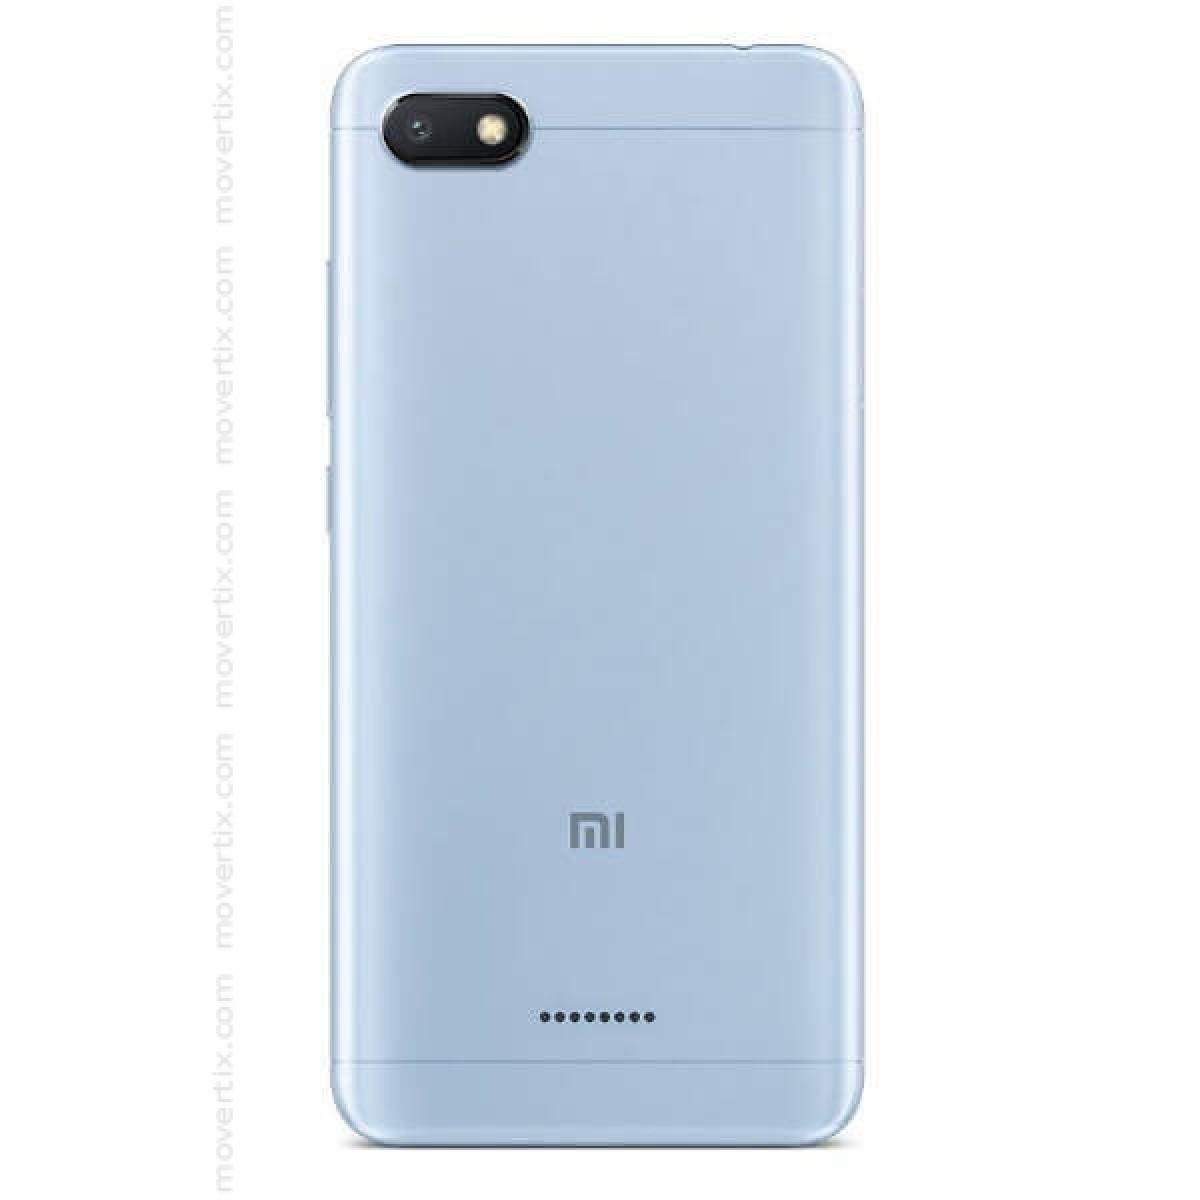 0f2e5abd1 Xiaomi Redmi 6A Dual SIM Blue 16GB and 2GB RAM (6941059605881) | Movertix Mobile  Phones Shop